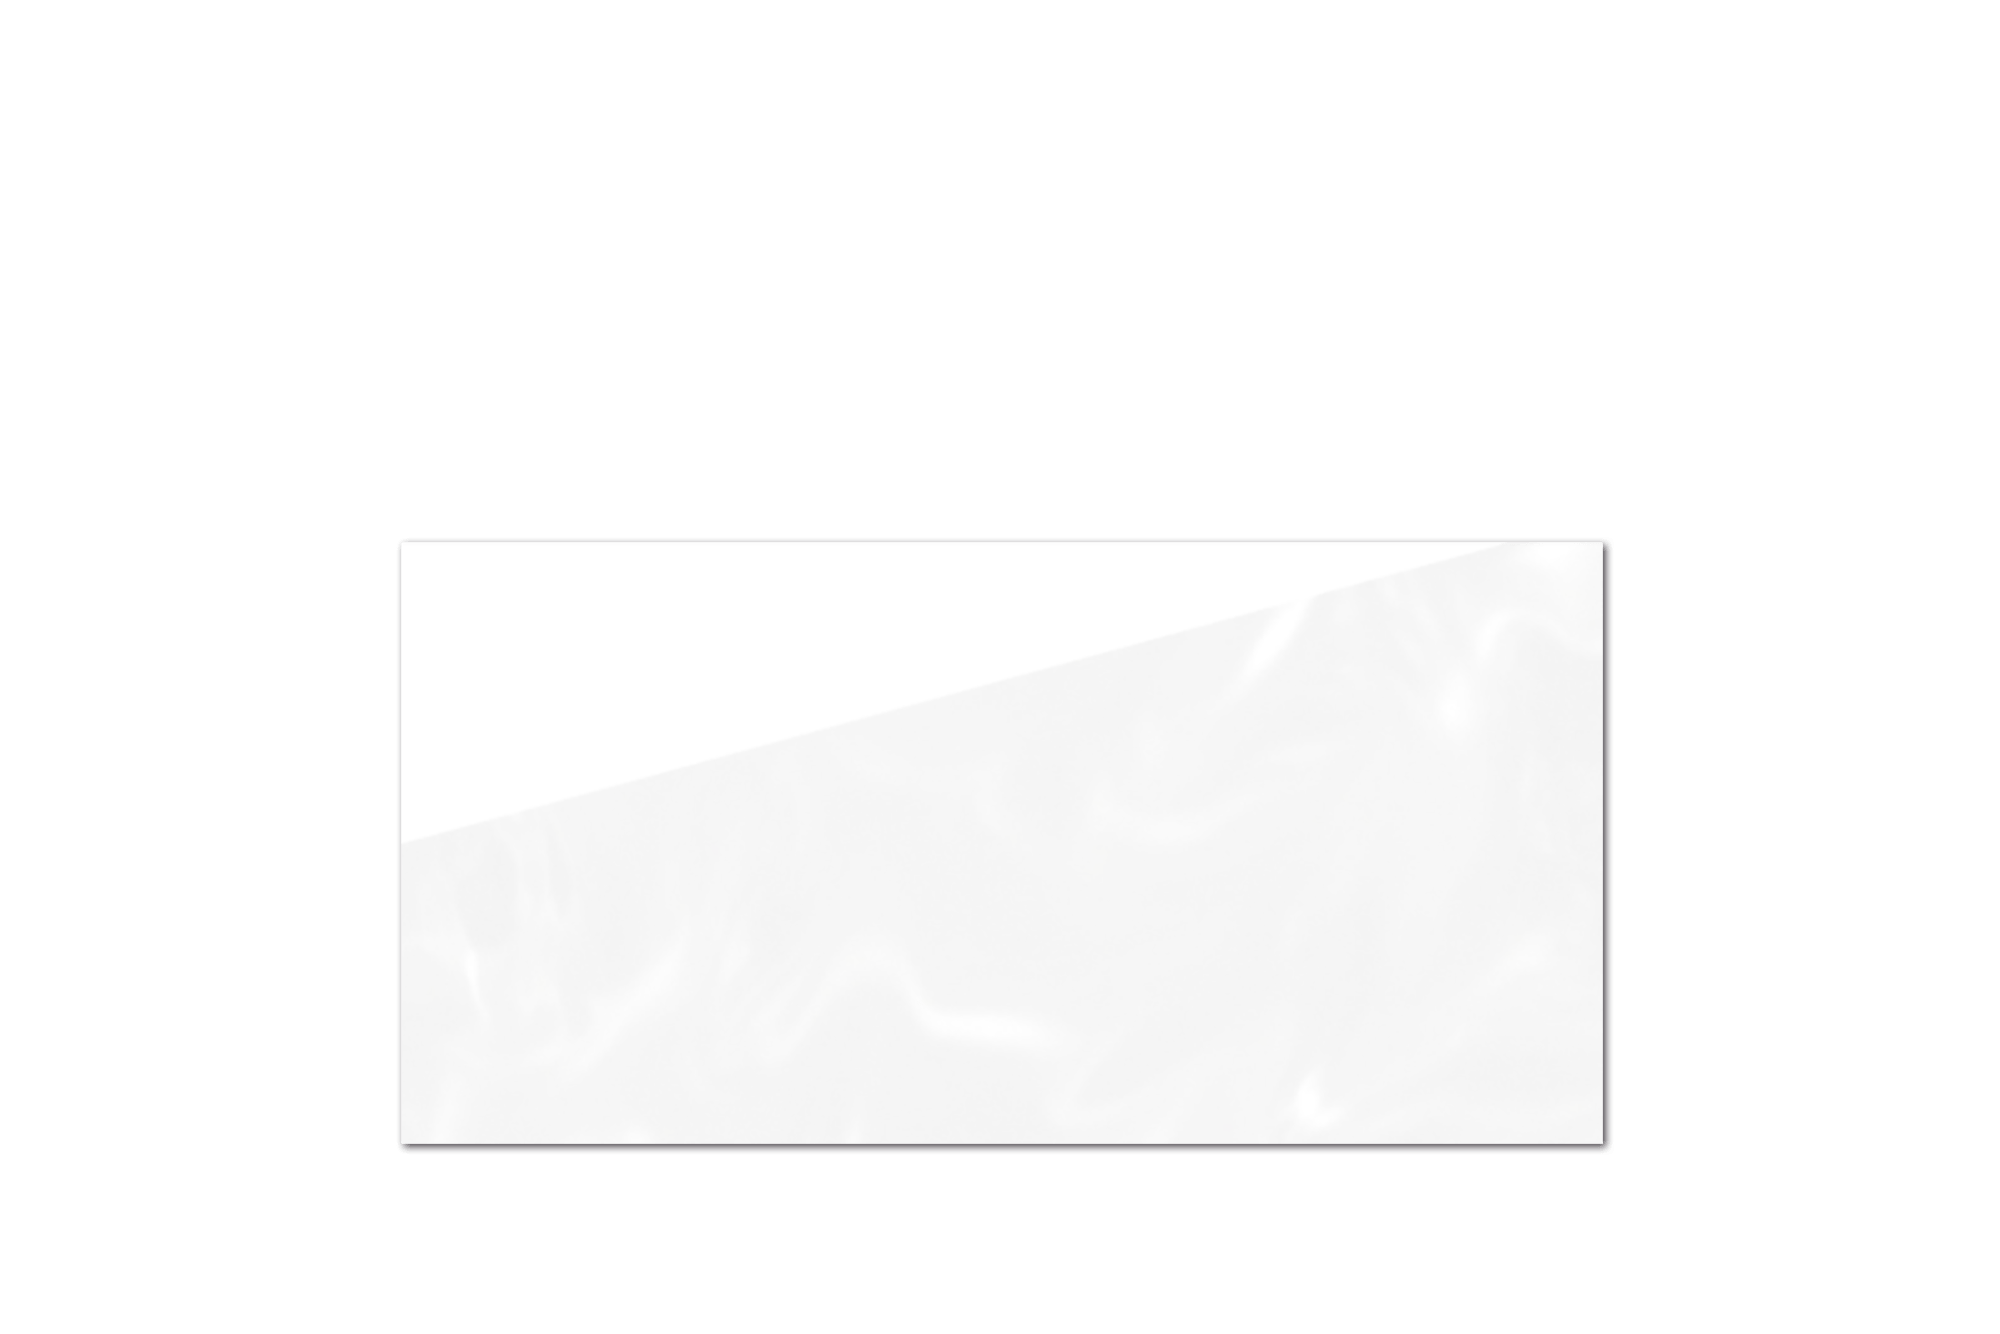 FUTURA 3060 weiß glänzend soft gewellt Image